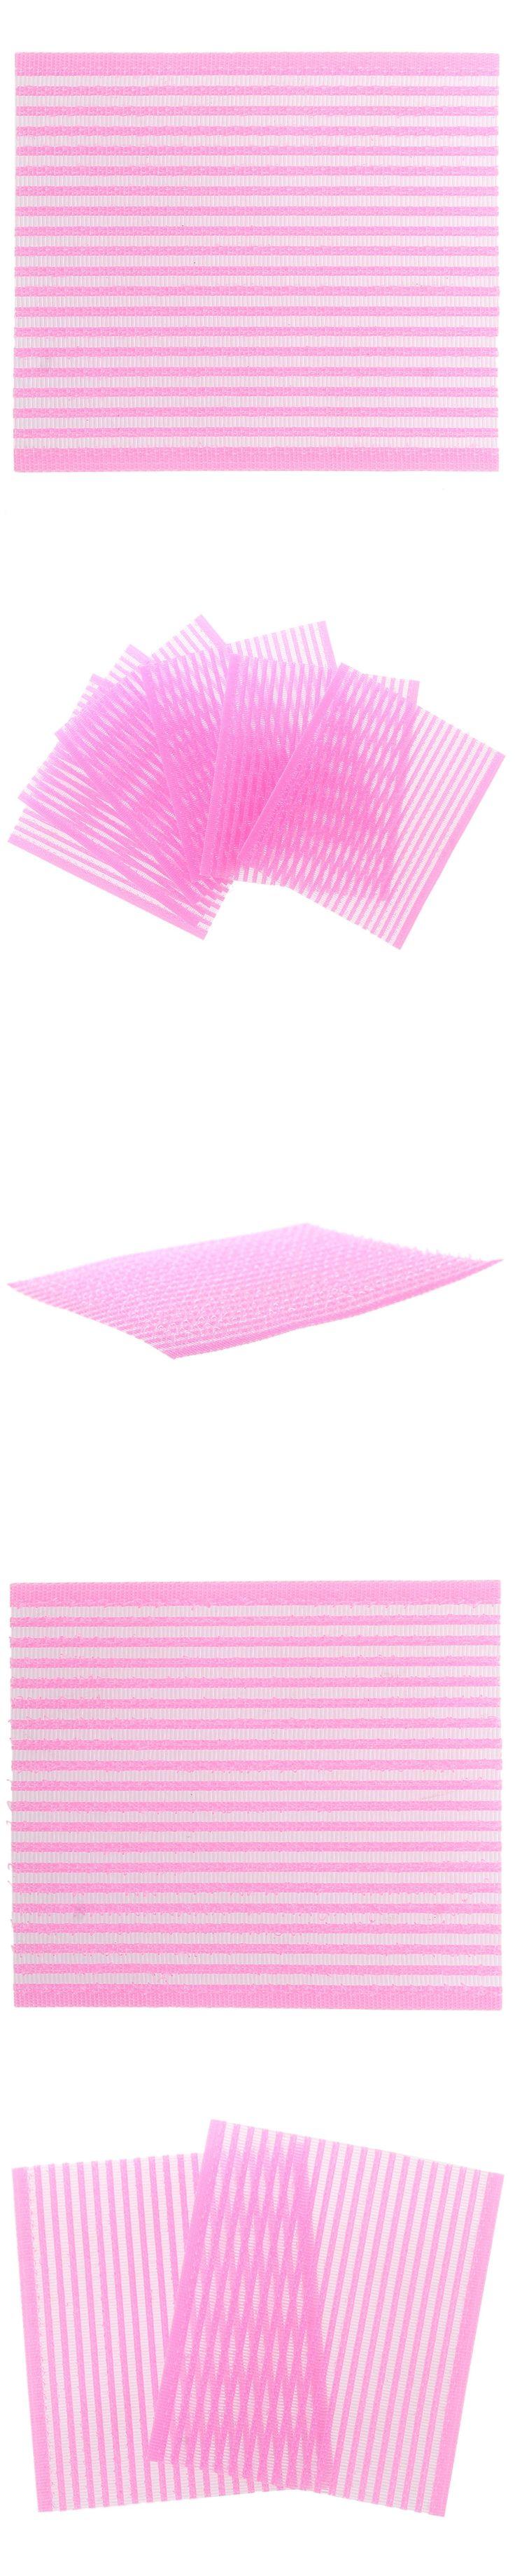 6 Pcs Plastic Magic Paste Posts Fringe Hair Bangs Stickers Pink